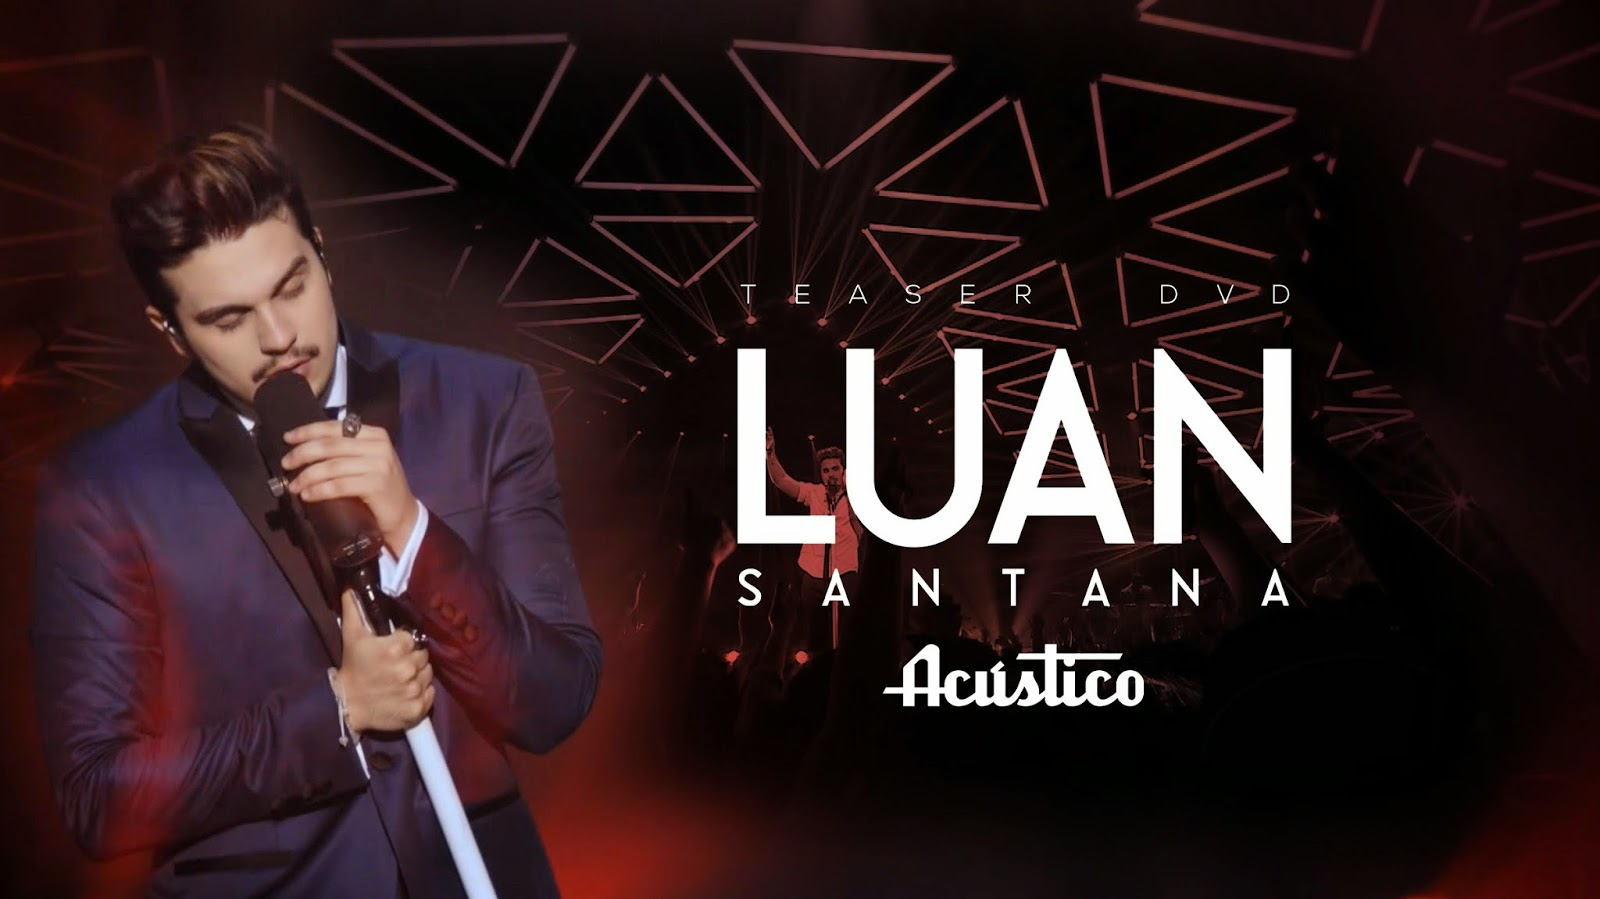 Luan Santana - DVD Luan Santana Acústico